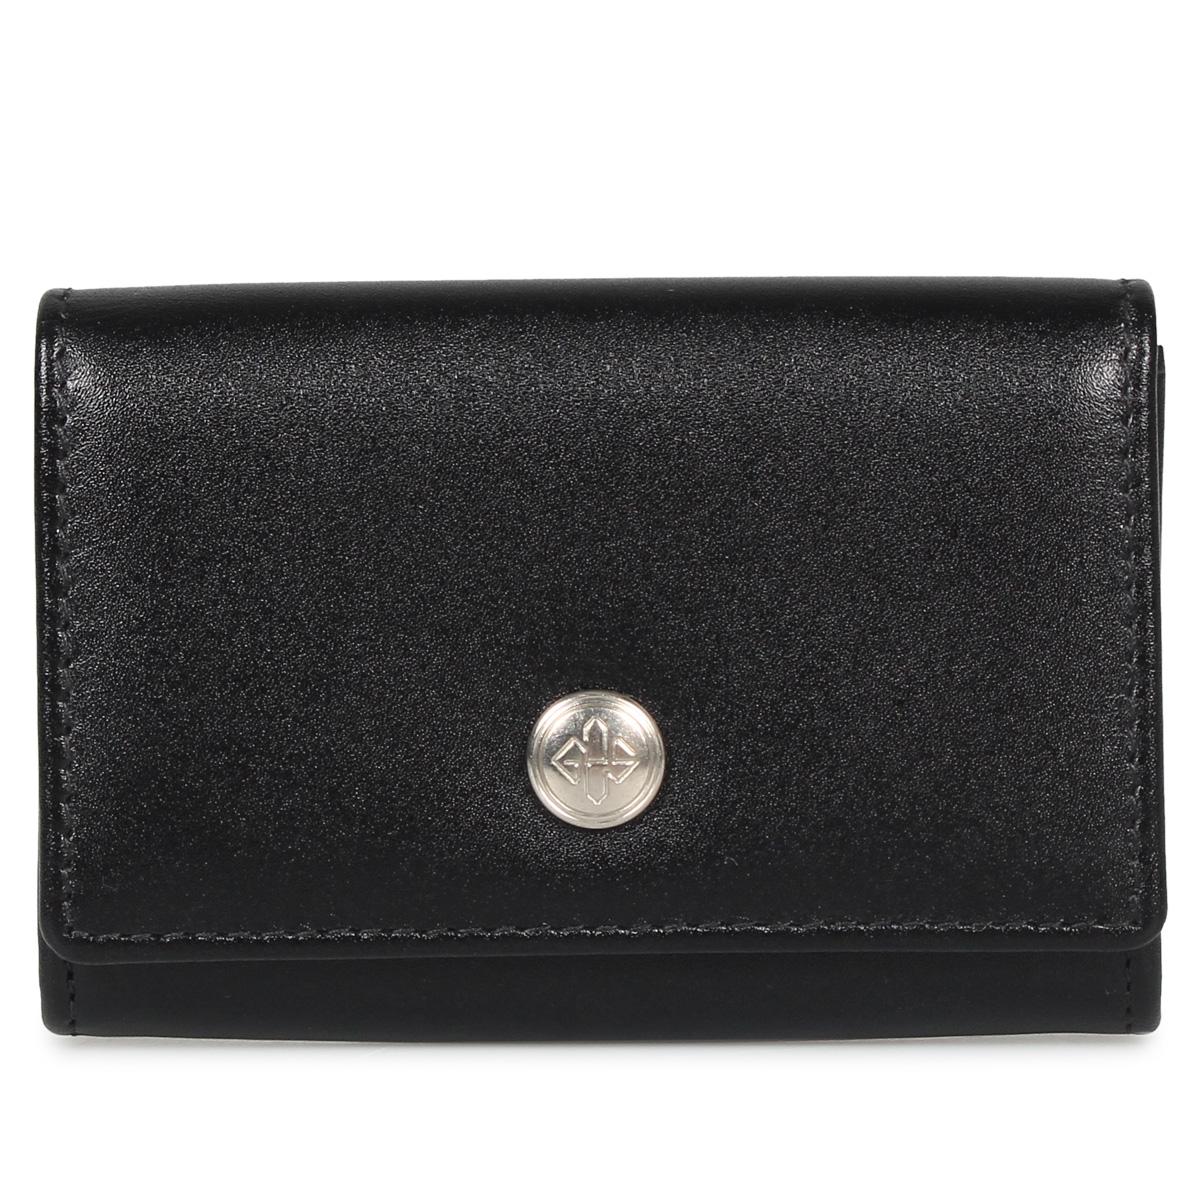 ETTINGER COIN PURSE W. CARD POCKET エッティンガー コインパース 財布 ミニ財布 メンズ レディース ターコイズ パープル ST2034DJR